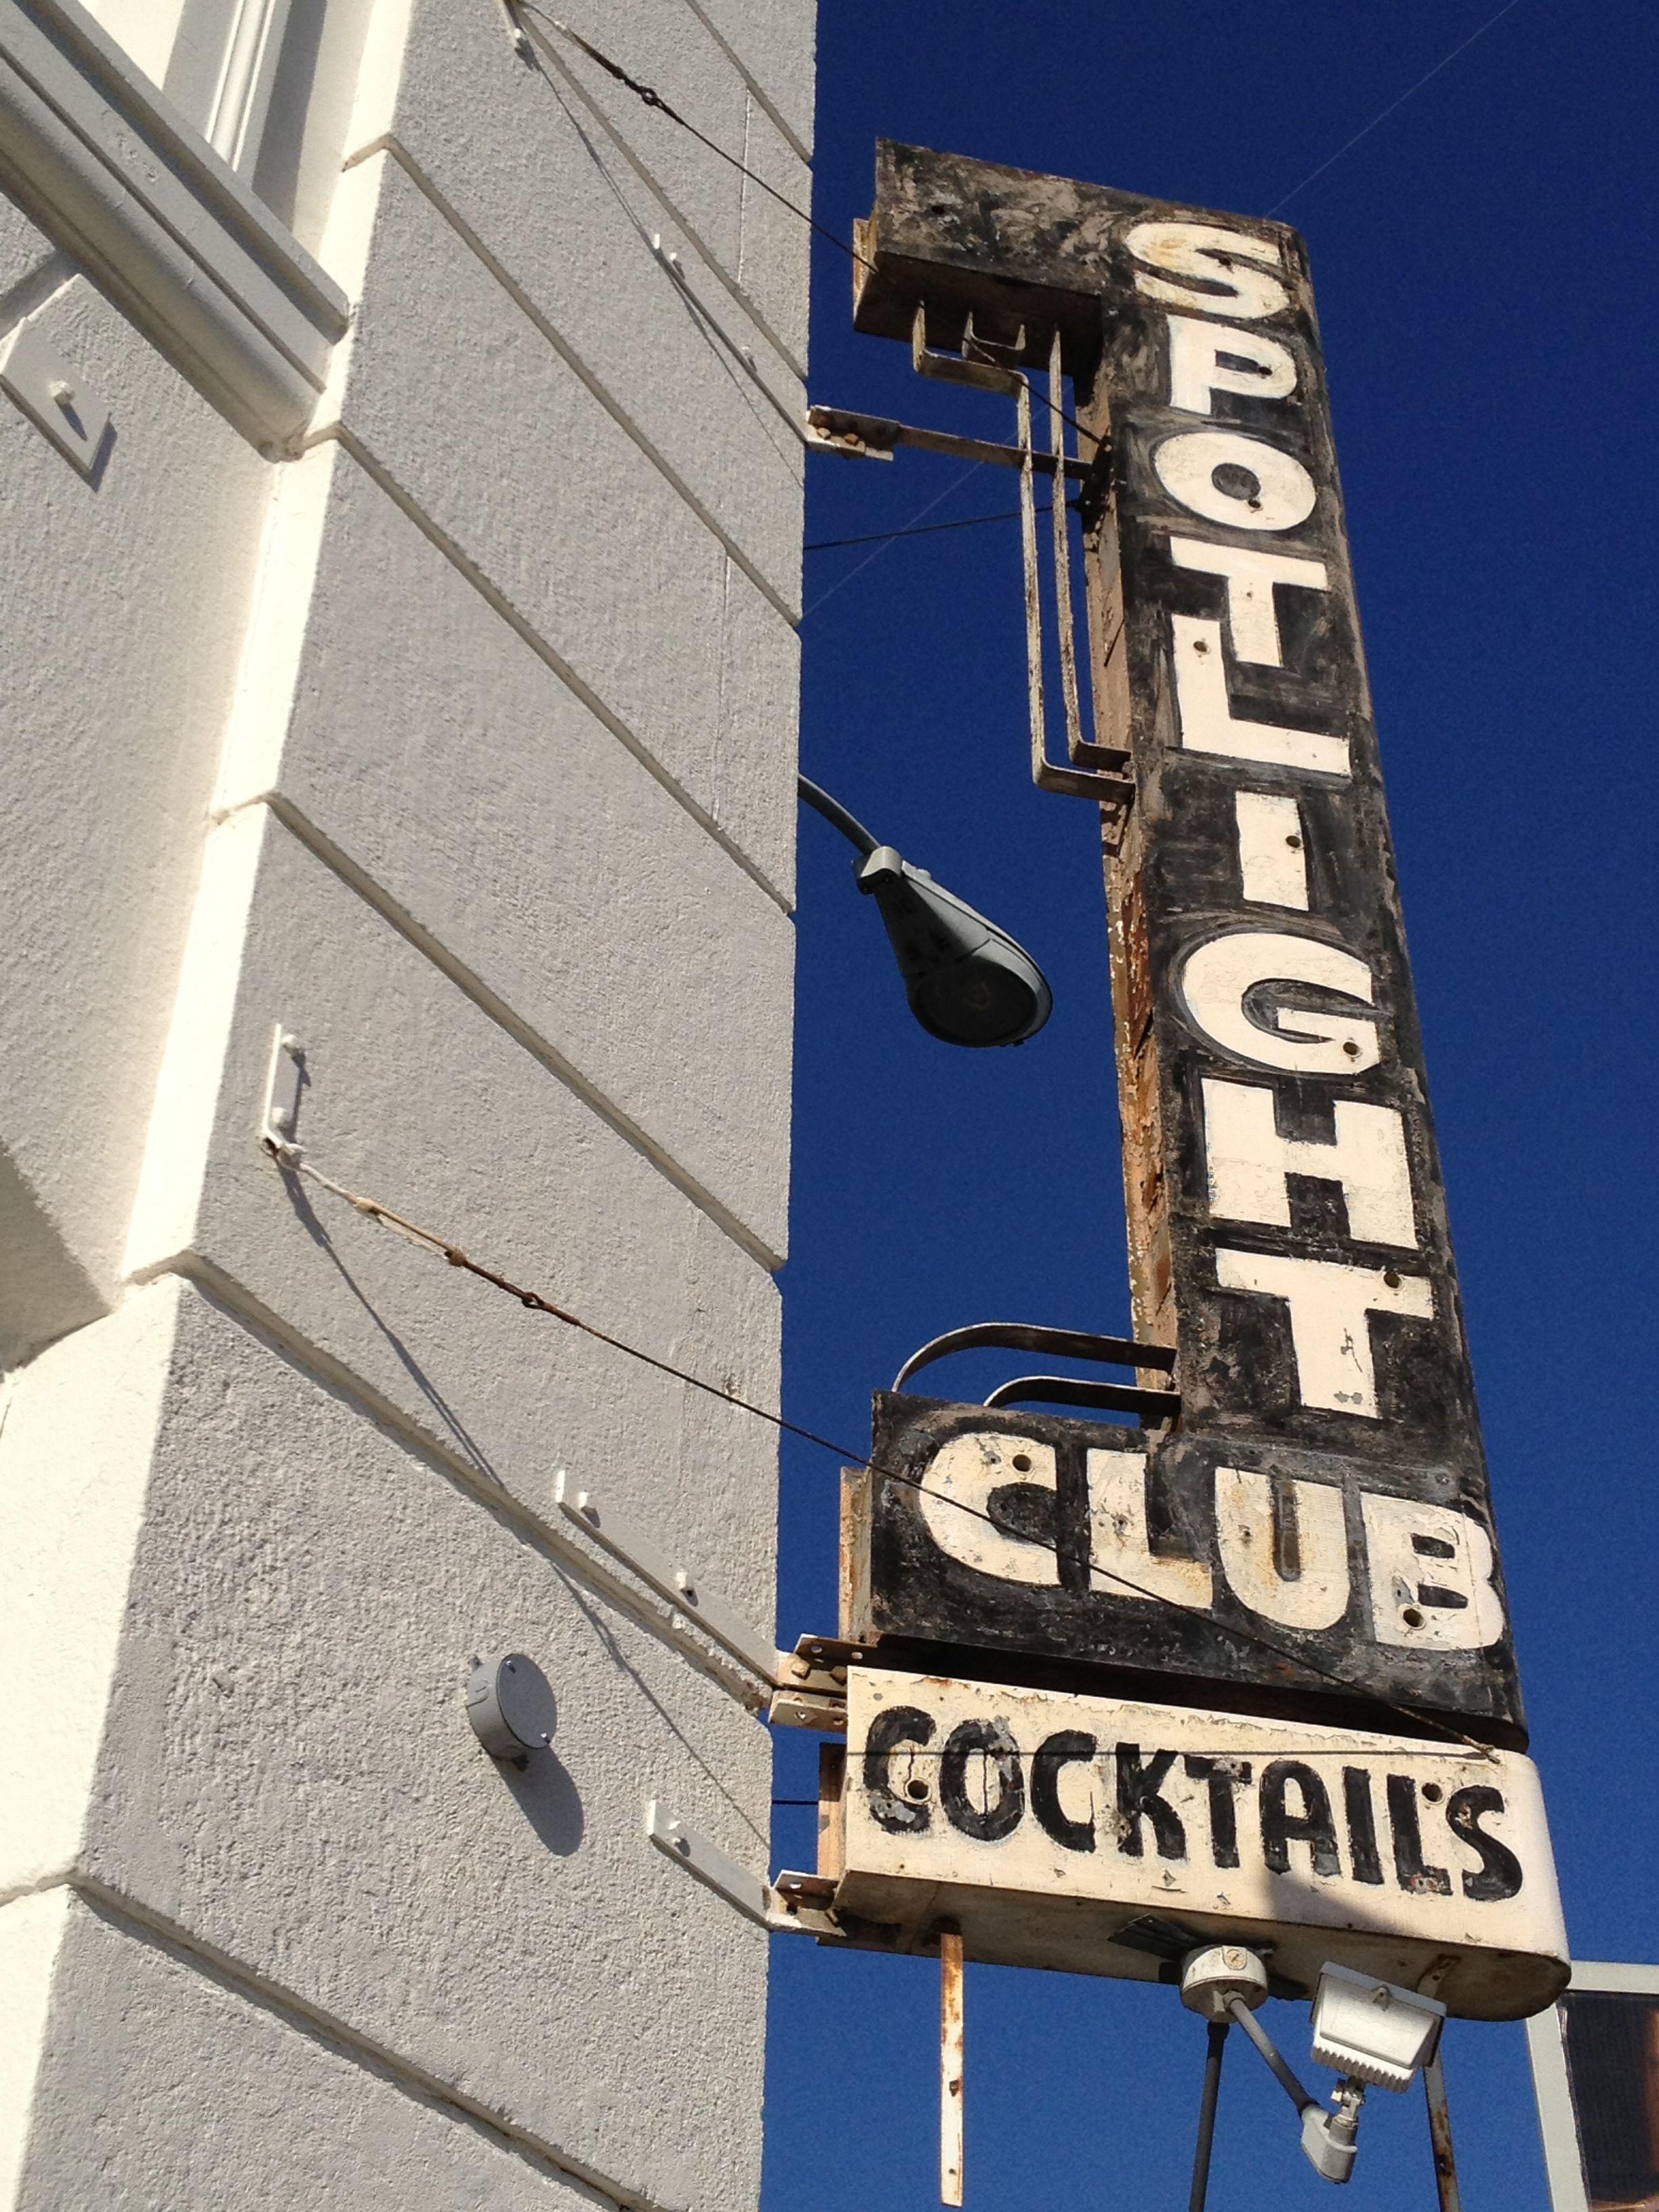 Spotlight Club ~ Old neon sign in LA